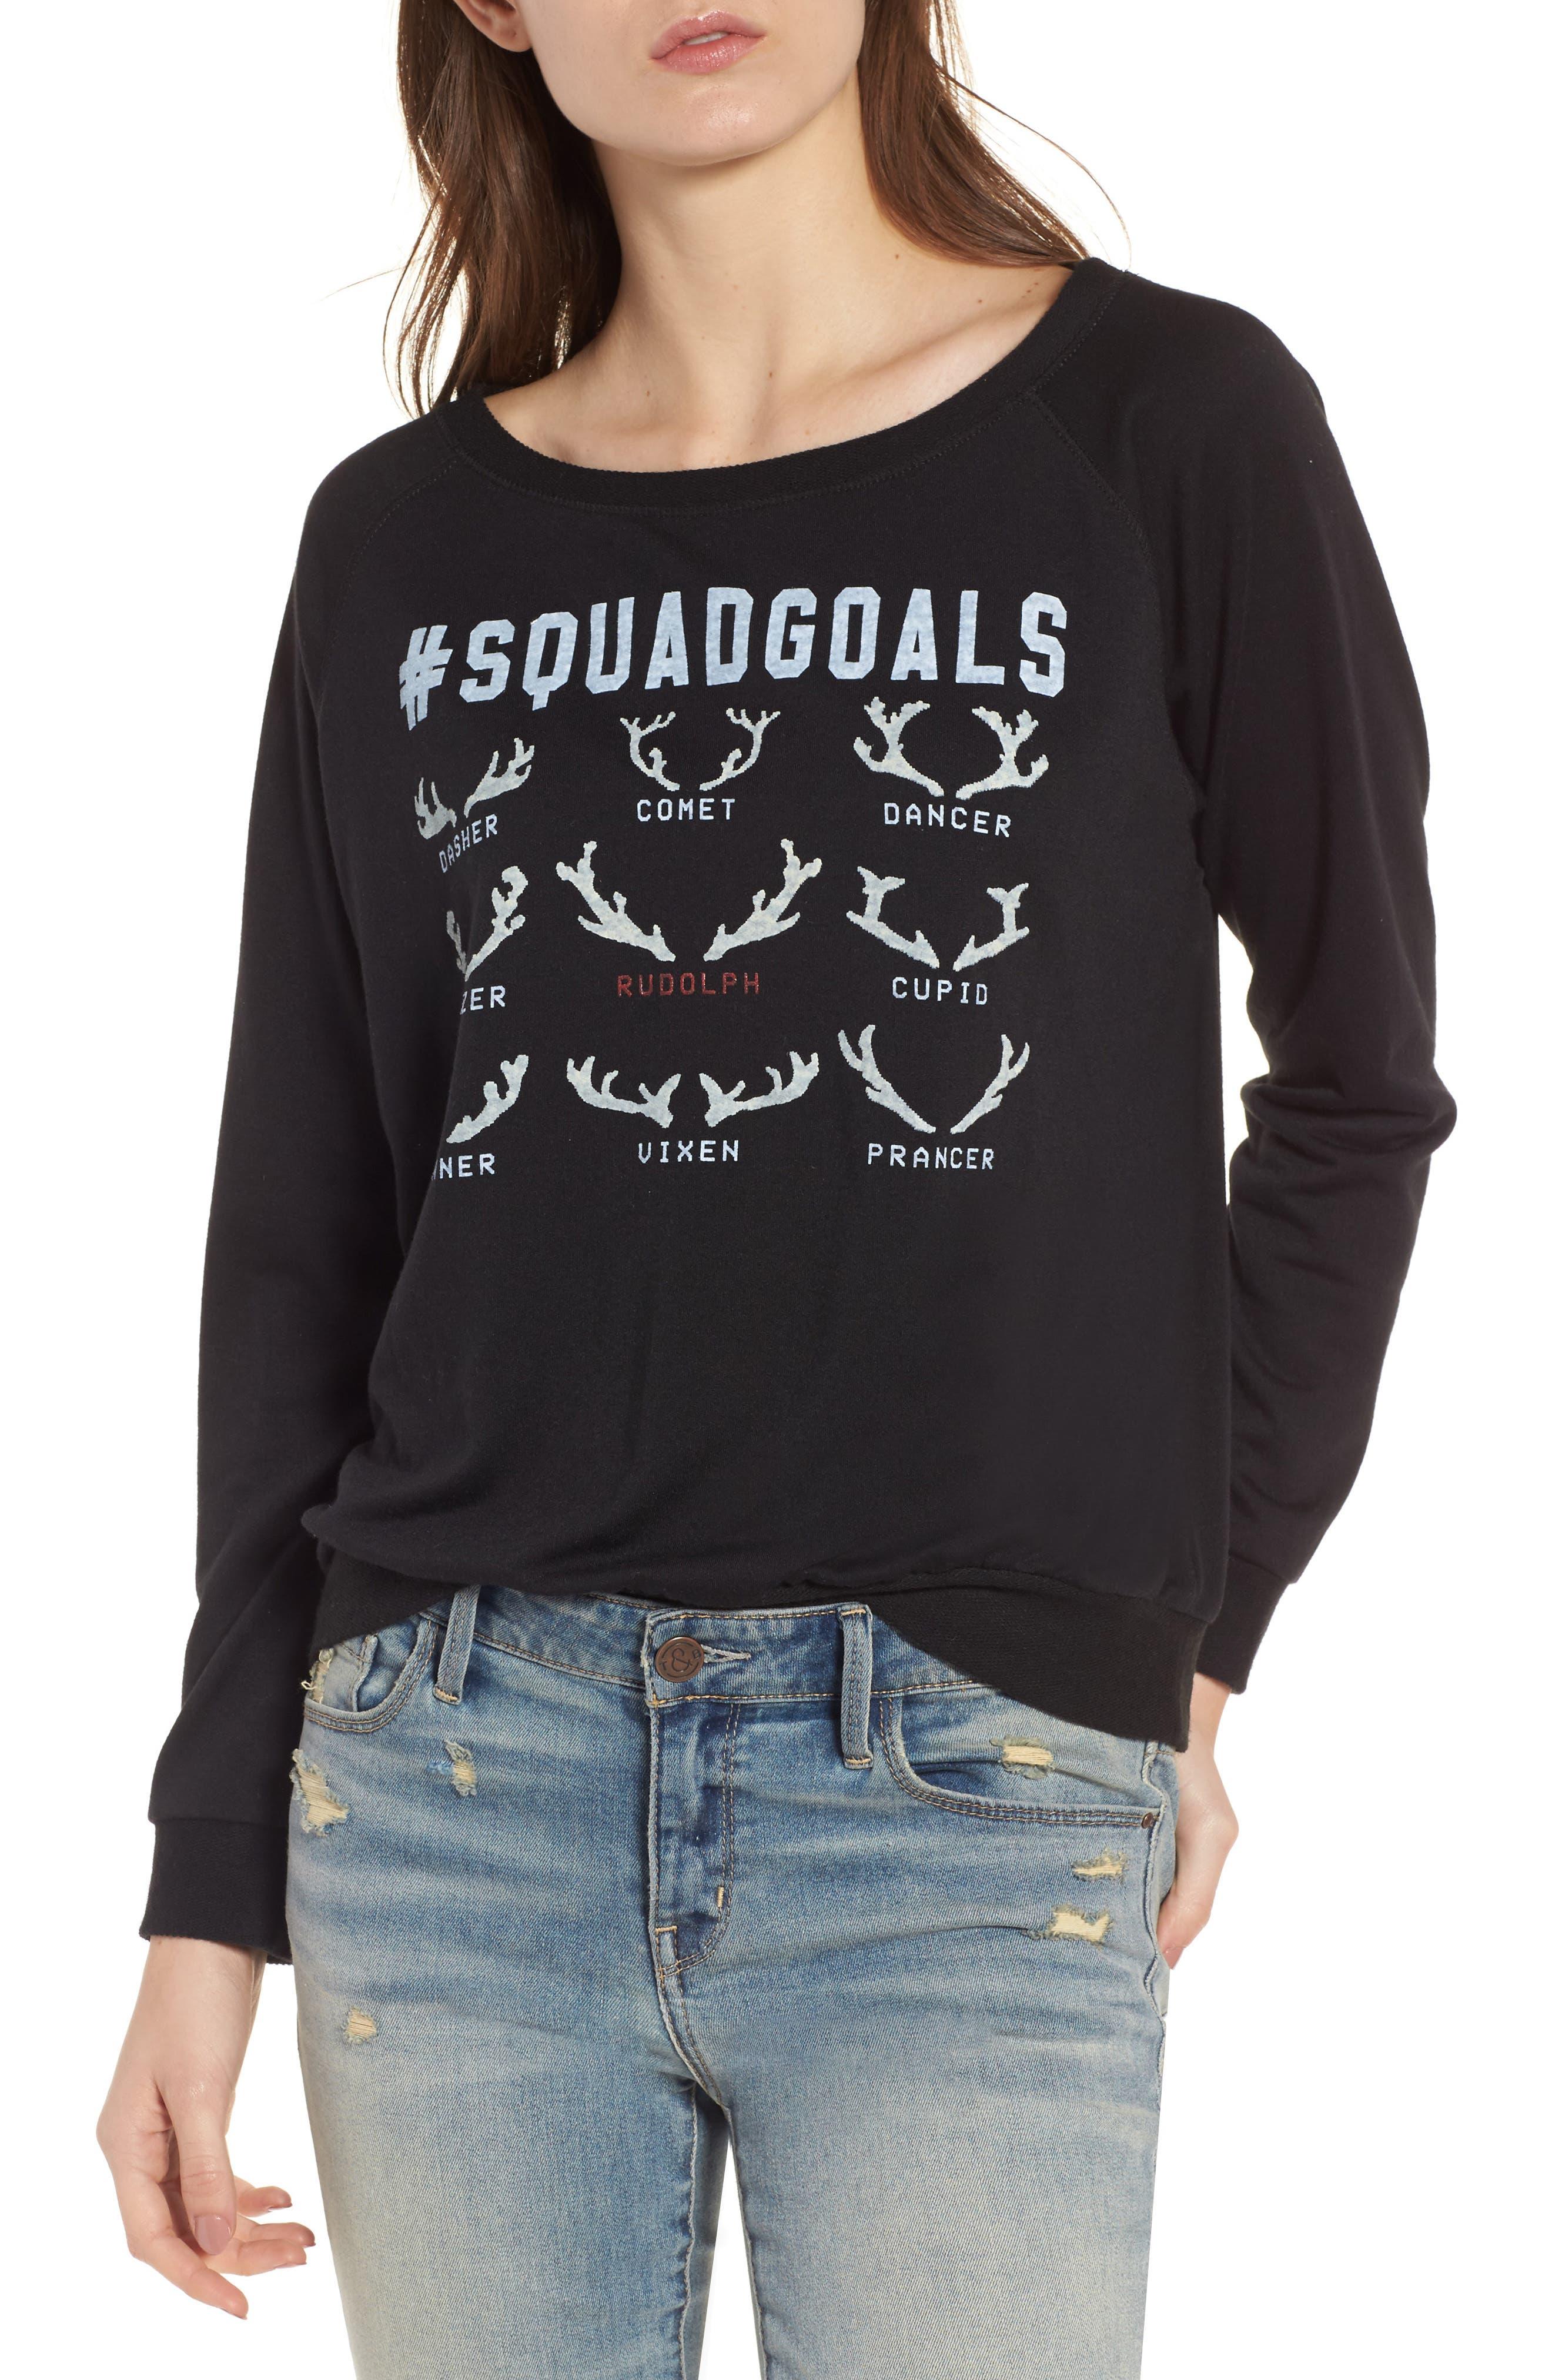 Prince Peter #SquadGoals Sweatshirt